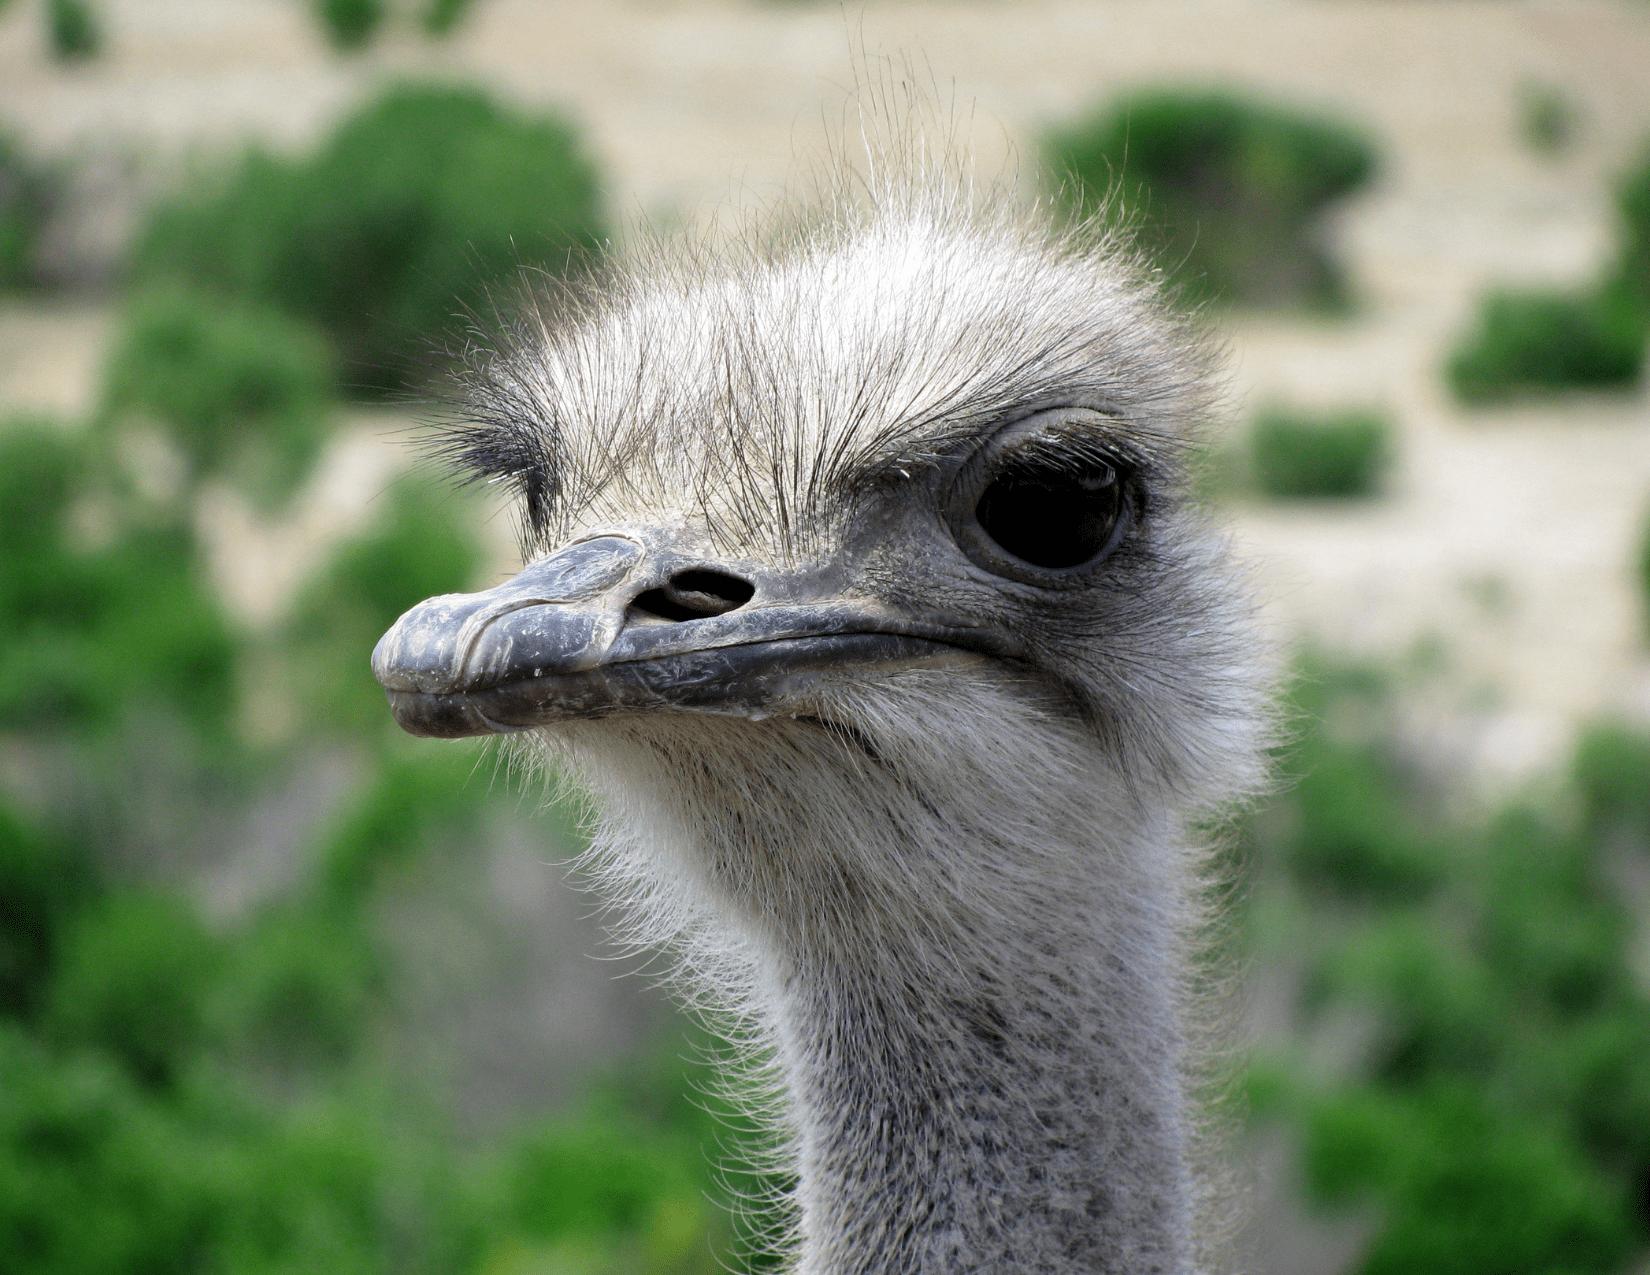 Ostrich at Ostrichland USA